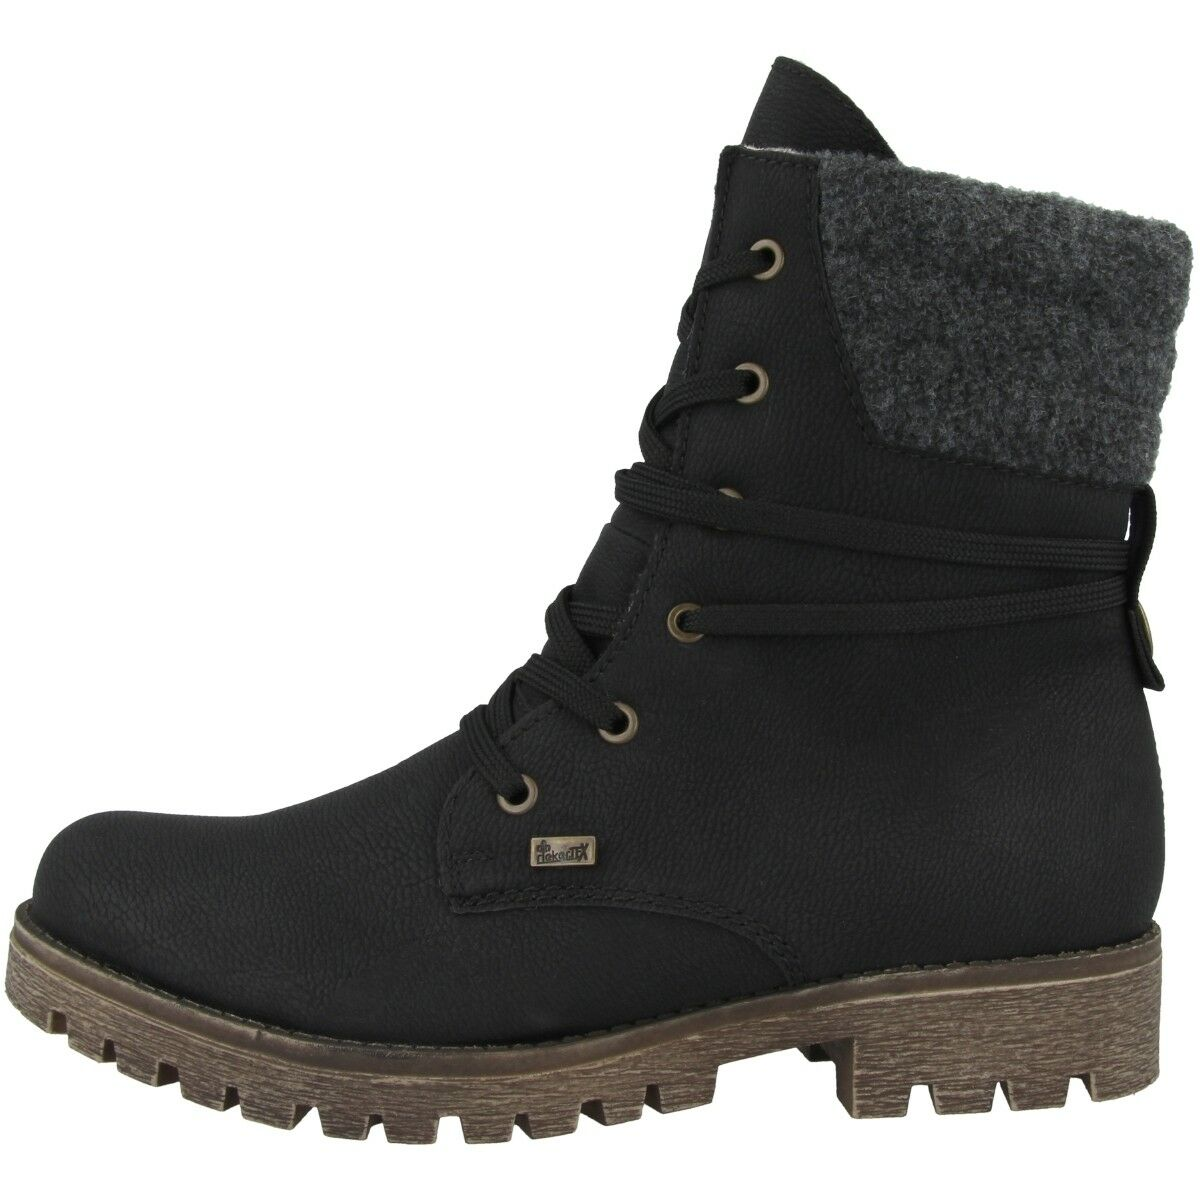 Black Bottine Rieker Chaussures Boots Bottes Femmes Mombasa Feutre qwqv8f7